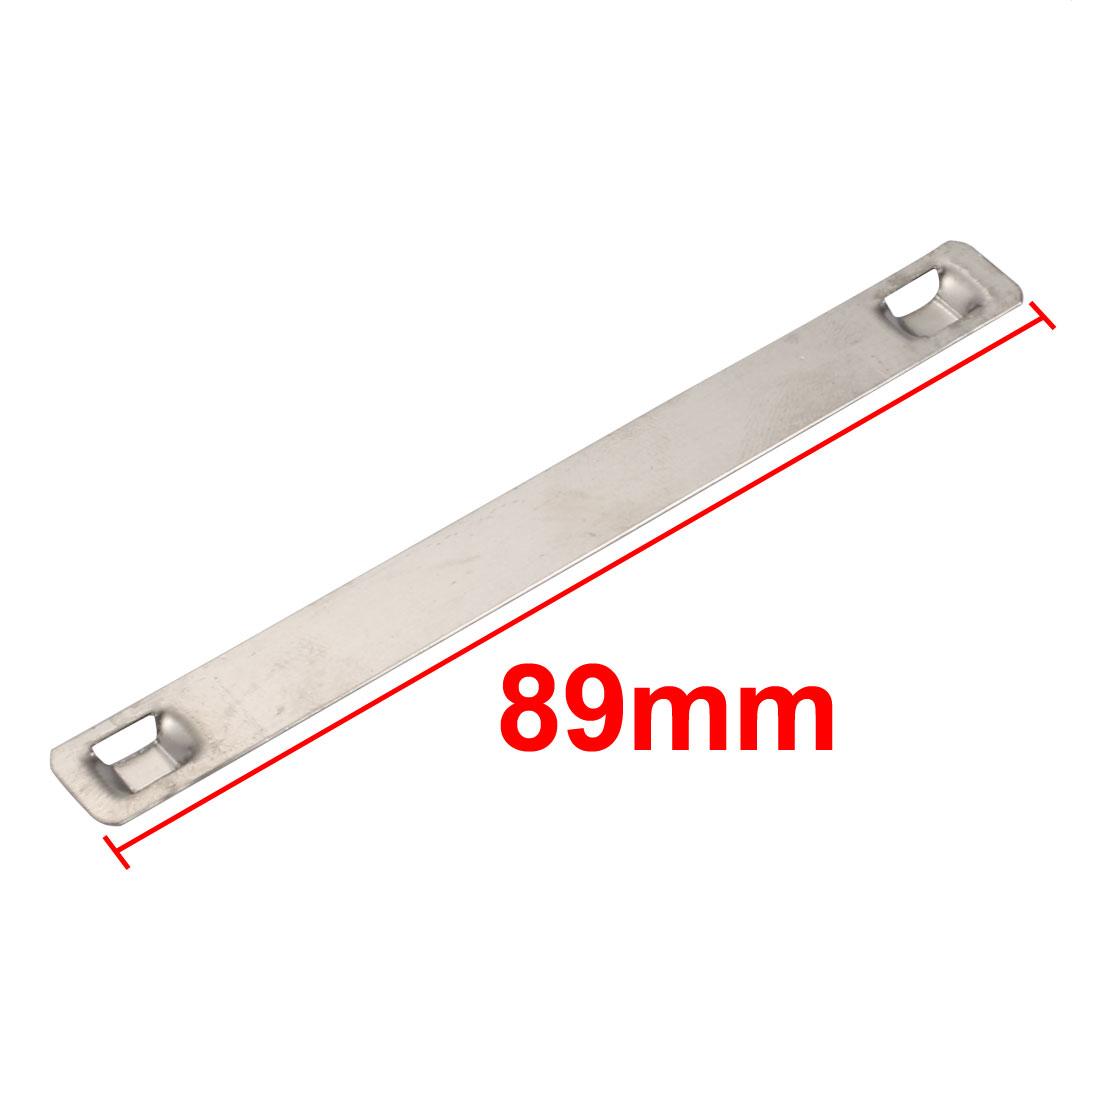 30pcs 10mm Width 89mm Length 316 Stainless Steel Marker Plate Silver Tone - image 2 de 3